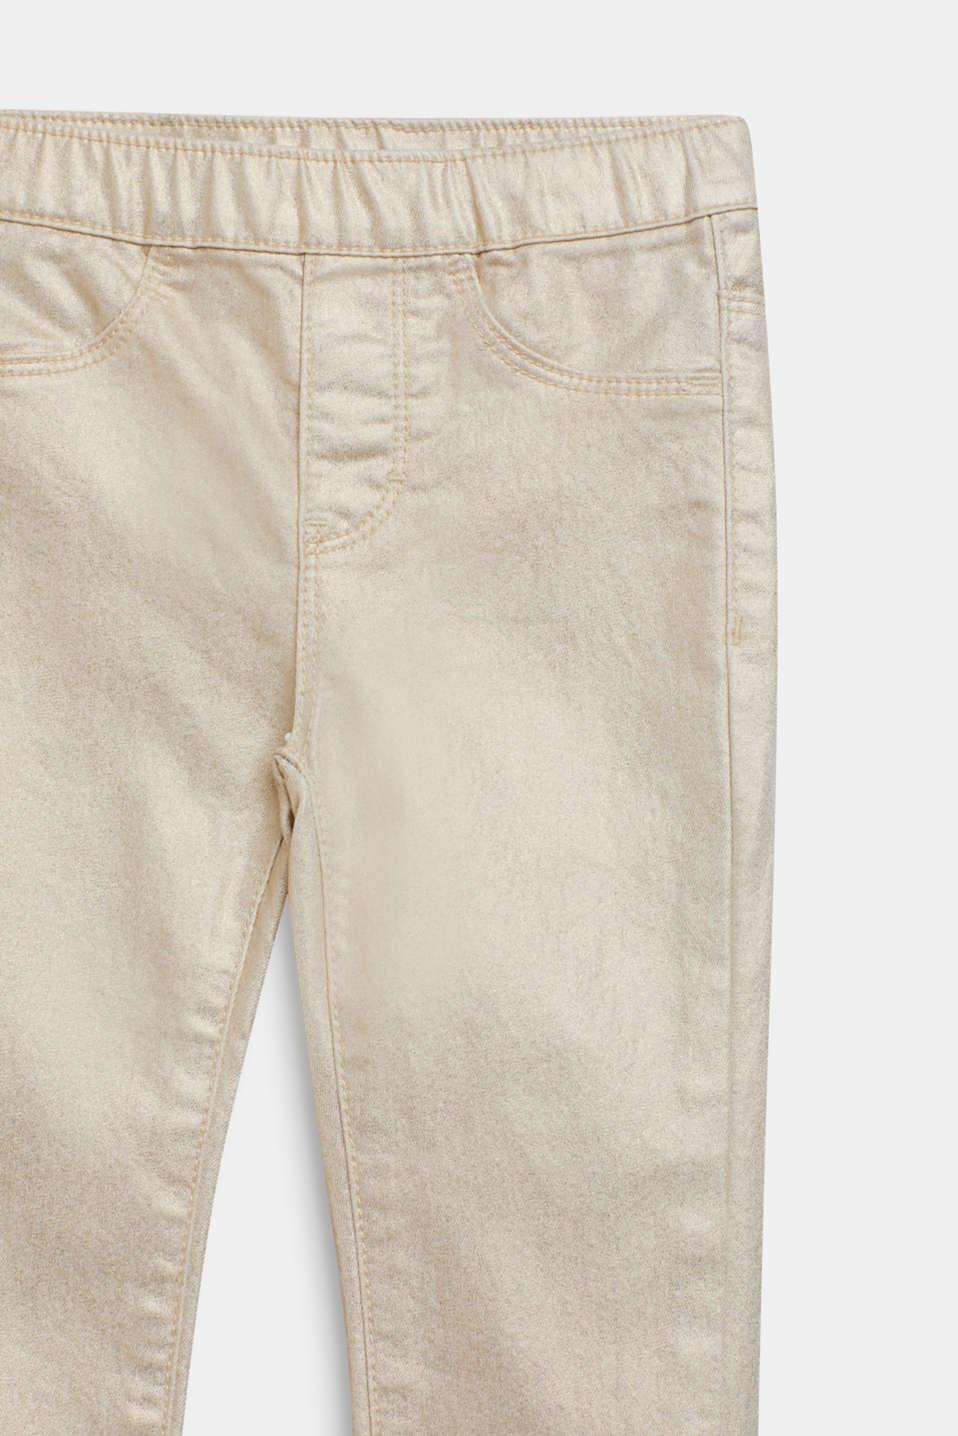 Pants denim, LCGOLD, detail image number 2